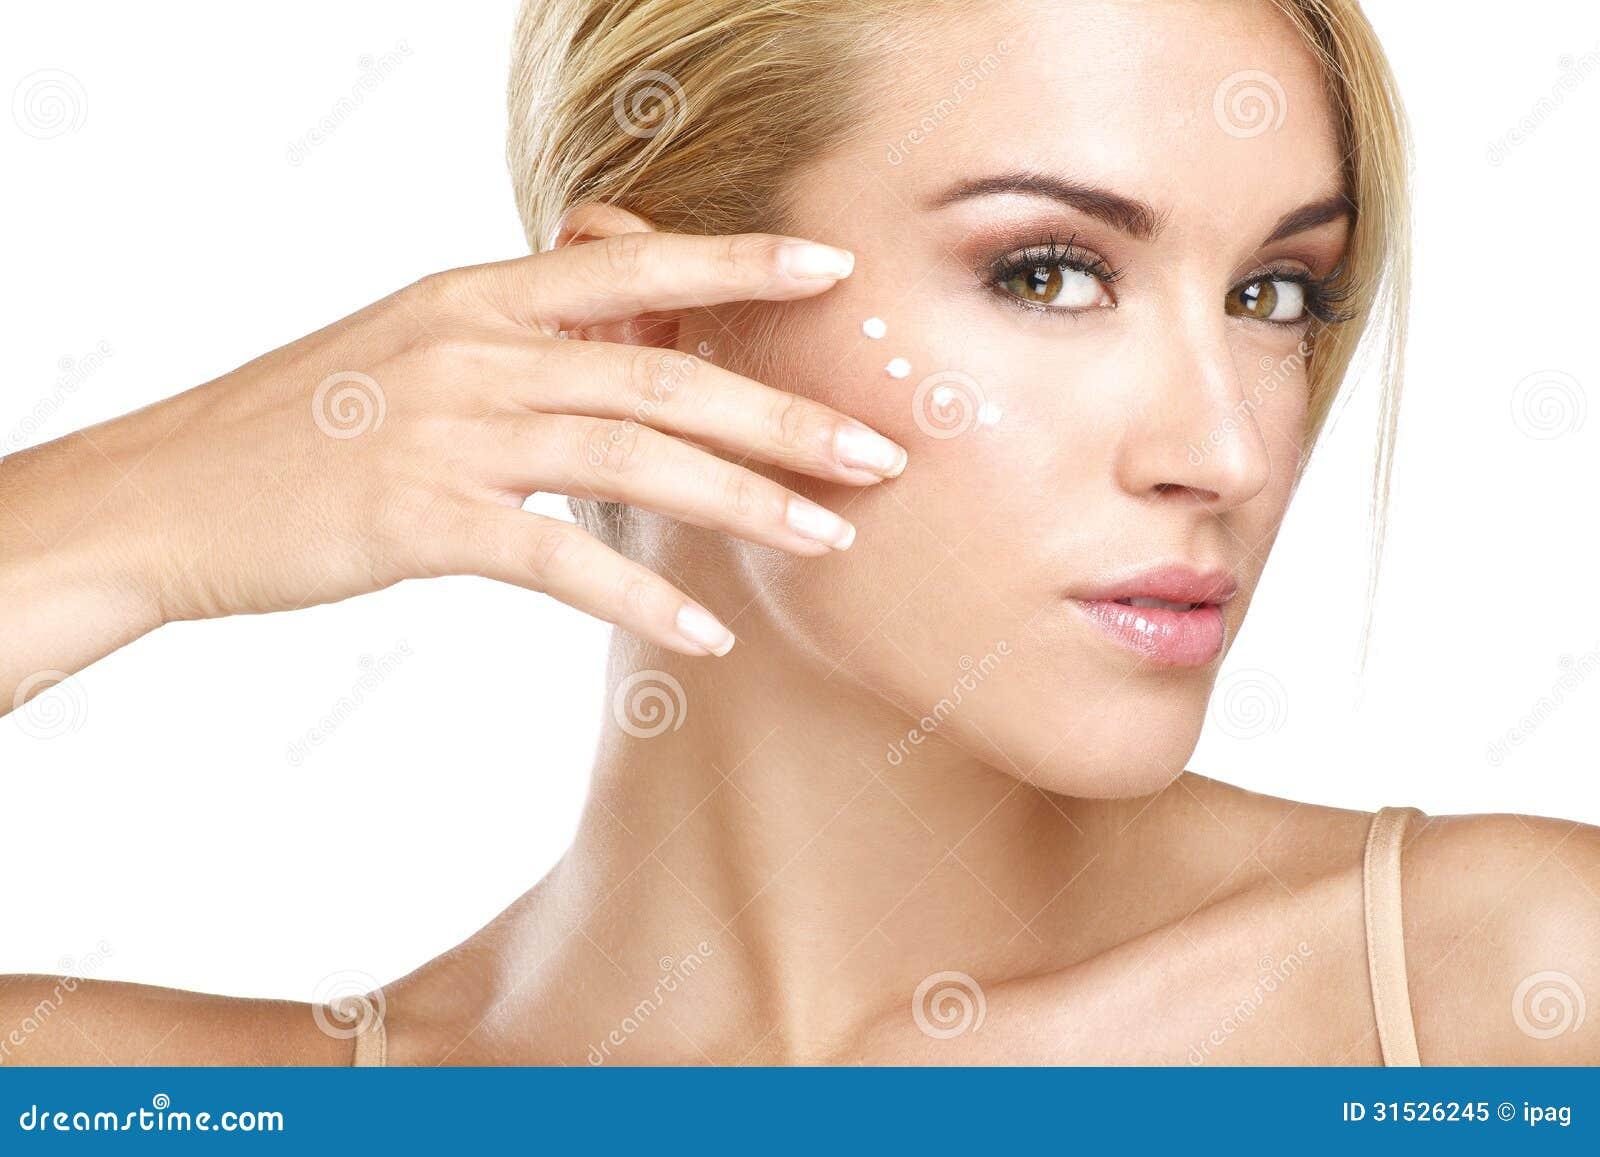 Young beautiful woman applying creme on her skin